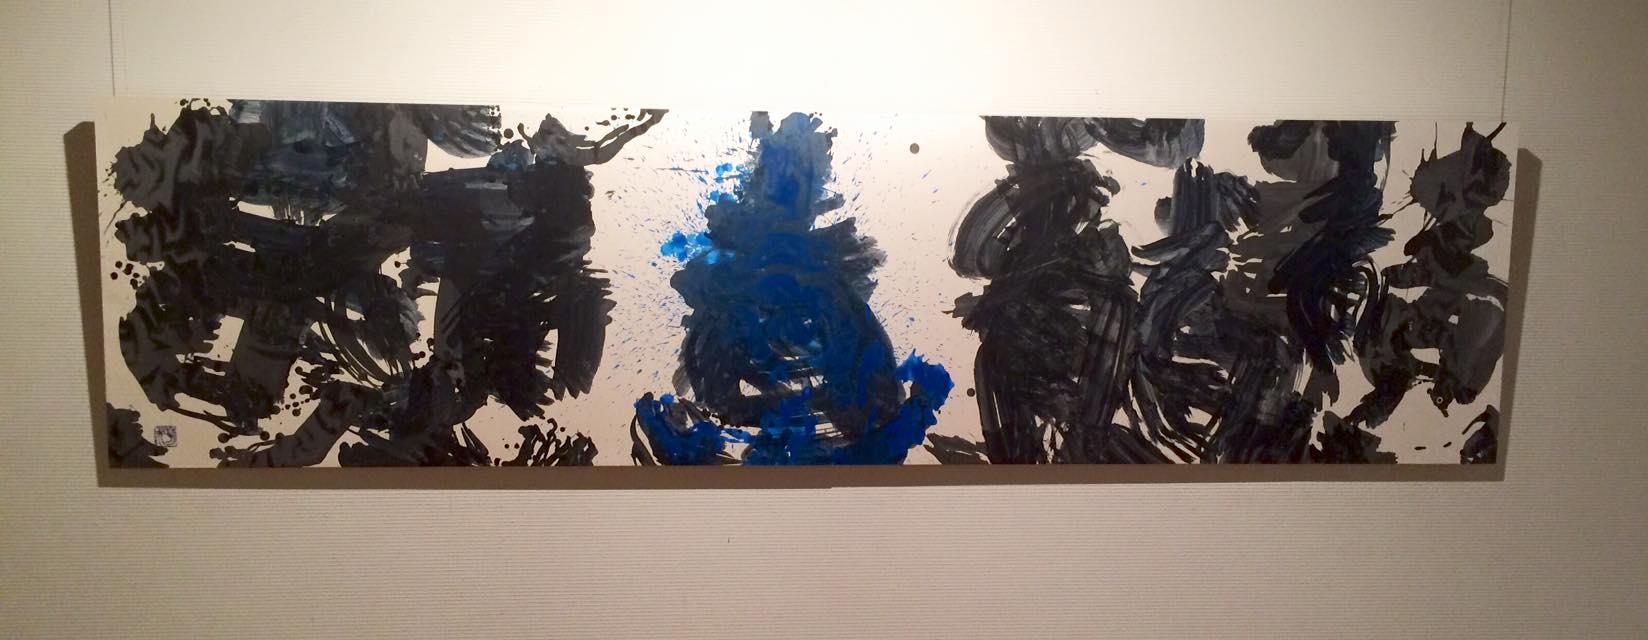 青い,天作会,書家,井上有一,展覧会,ボンド,墨,東京,作品,海上雅臣,日々の絶筆